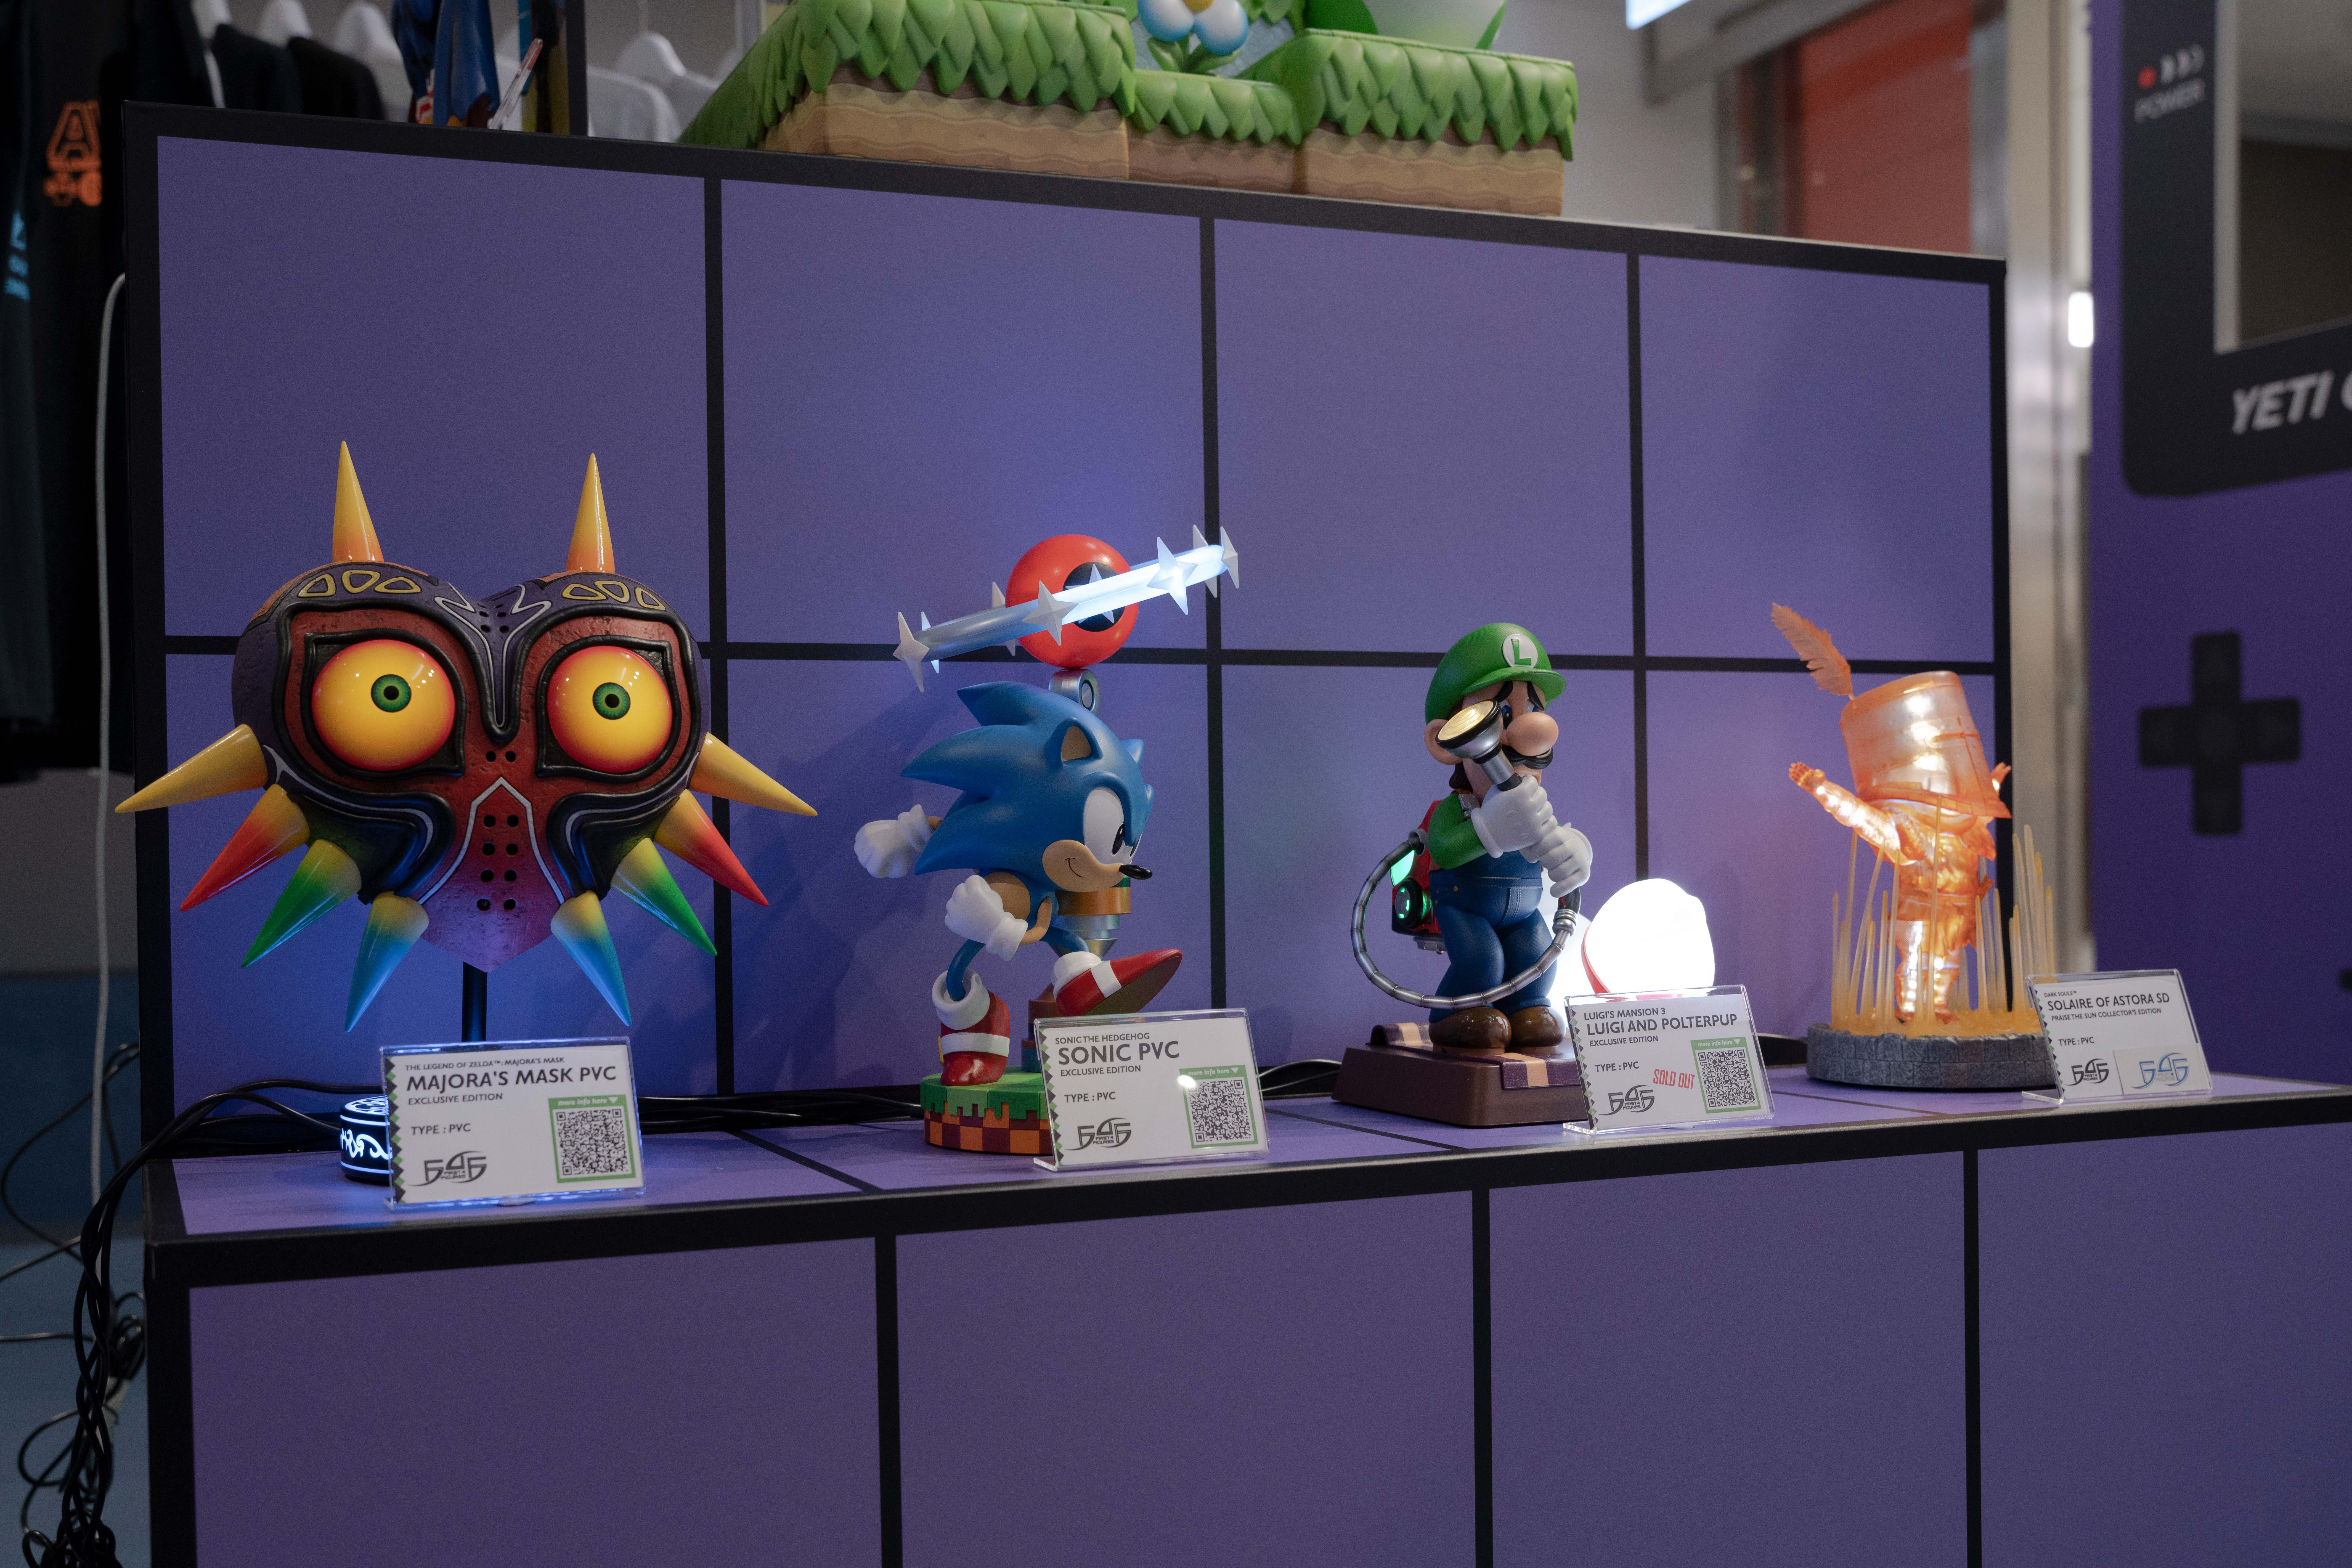 First 4 Figures PVC Statues at AV BELOWGROUND Arcade